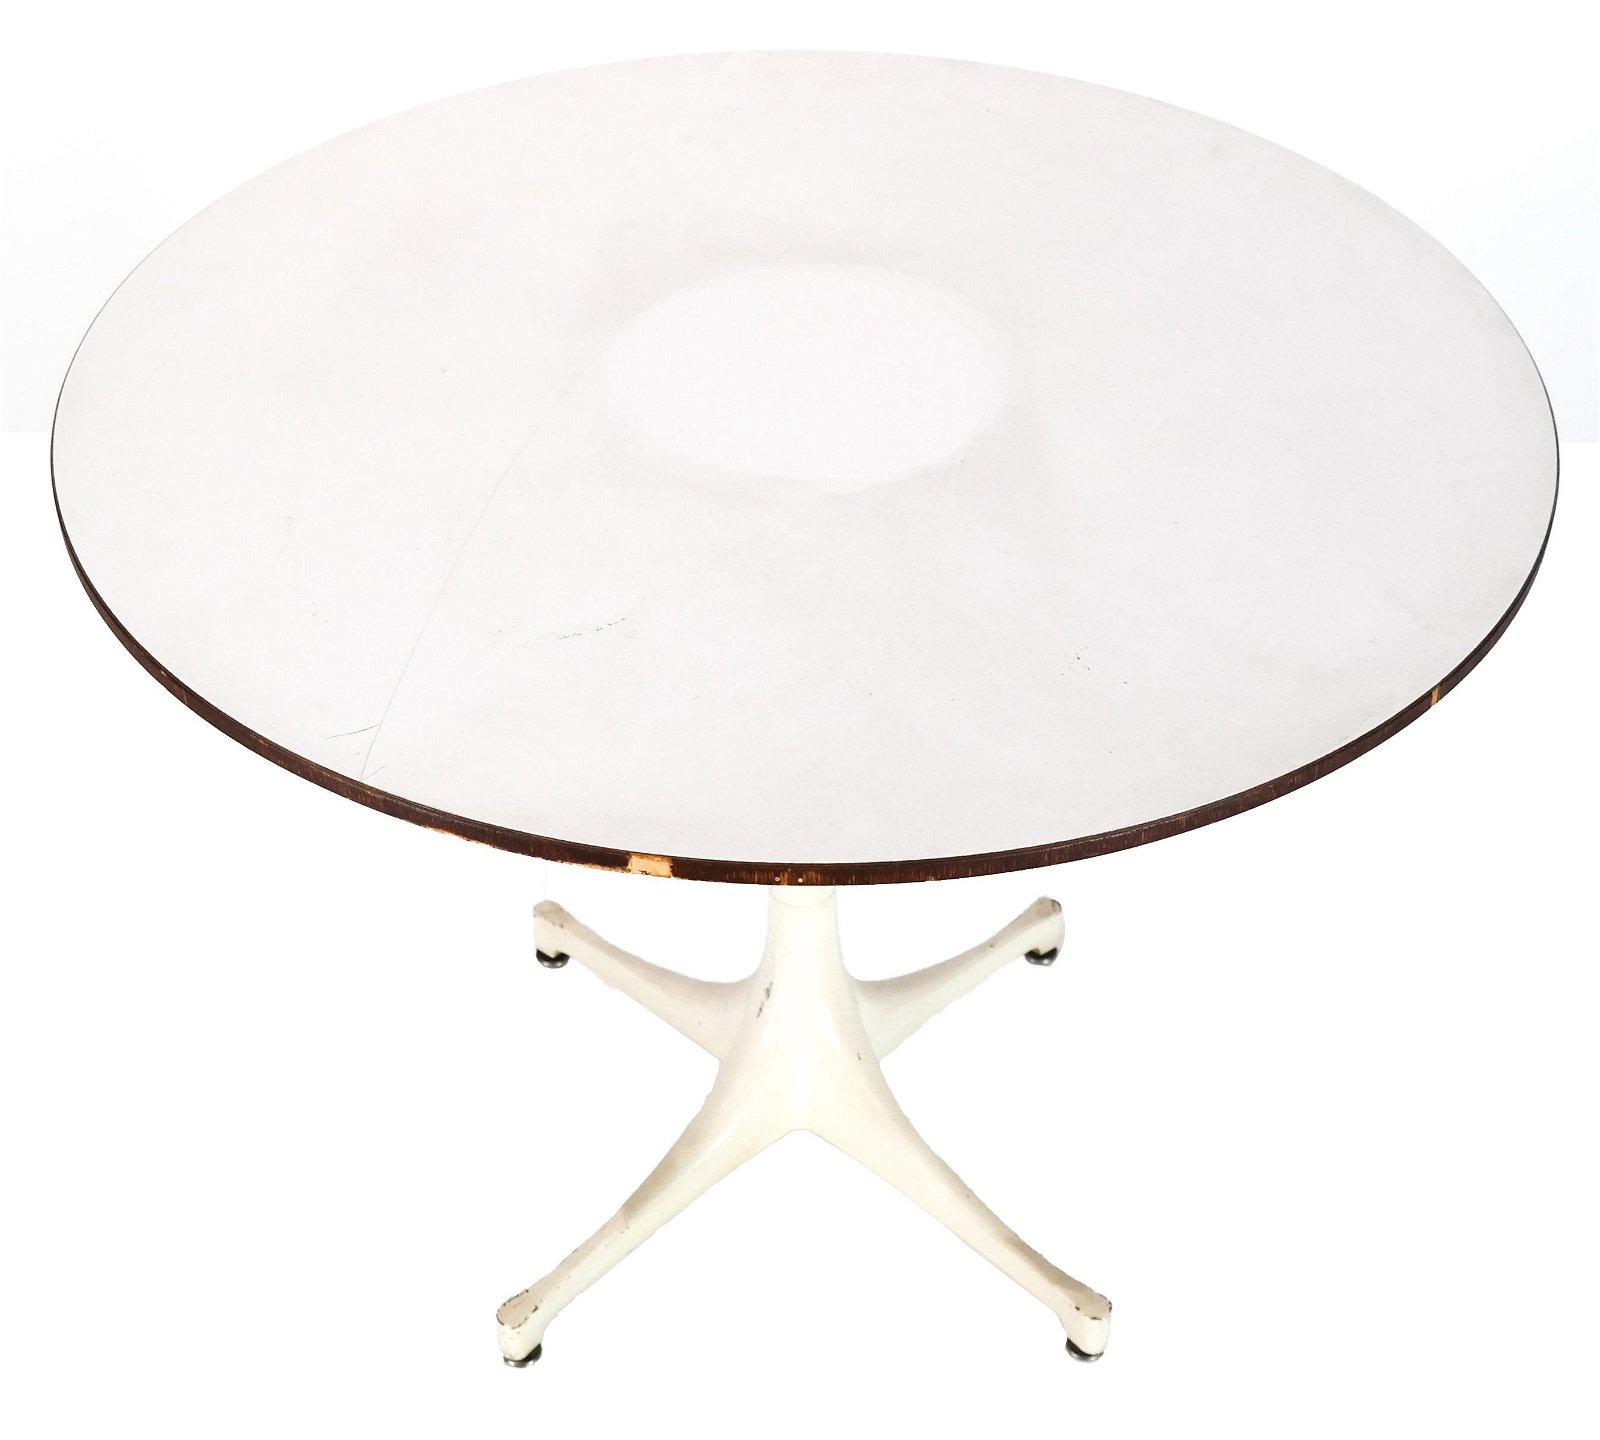 Charles Eames for Herman Miller Table